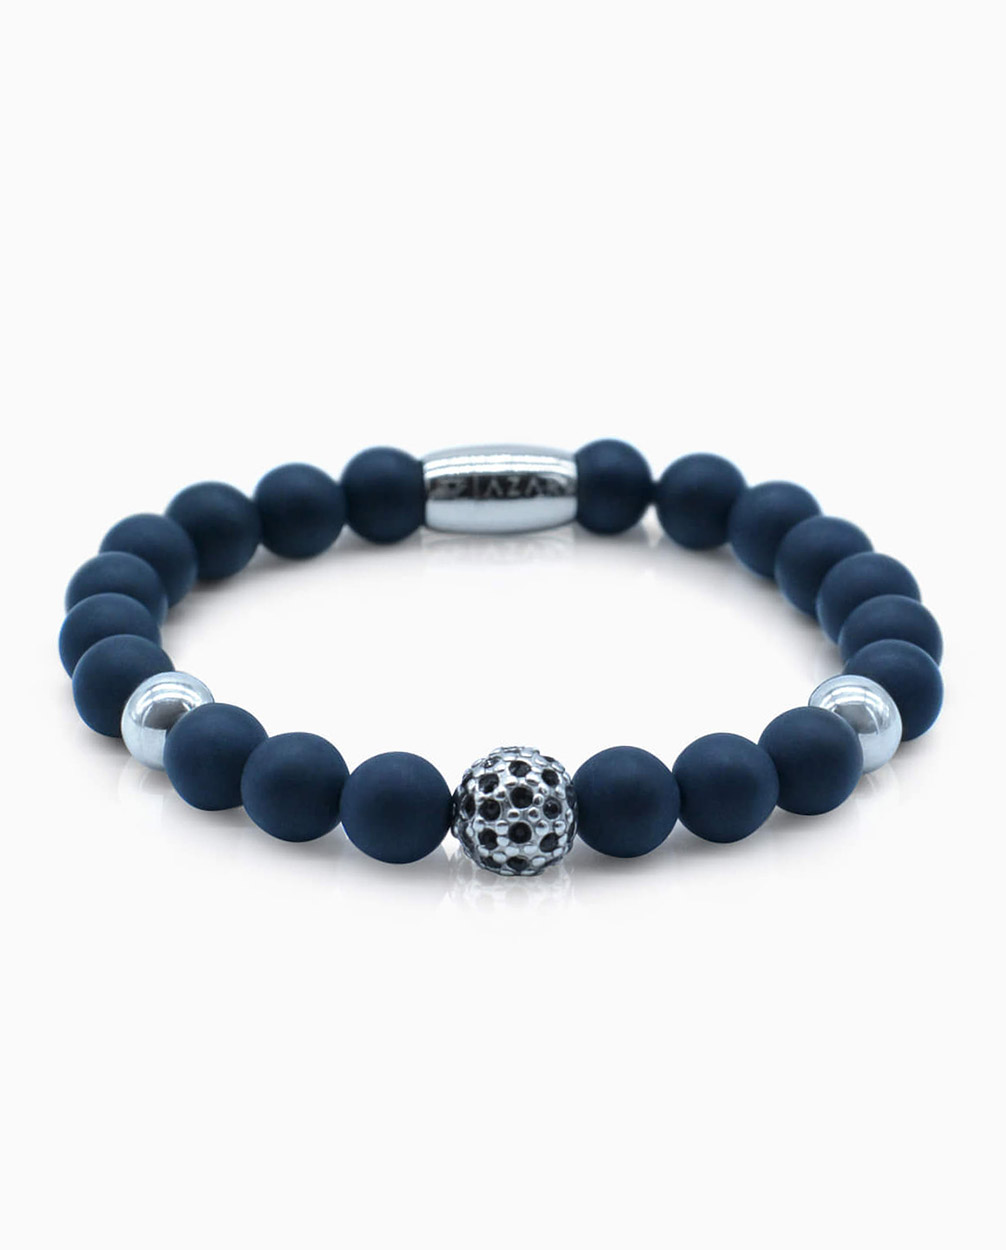 agate-gemstone-bead-bracelet